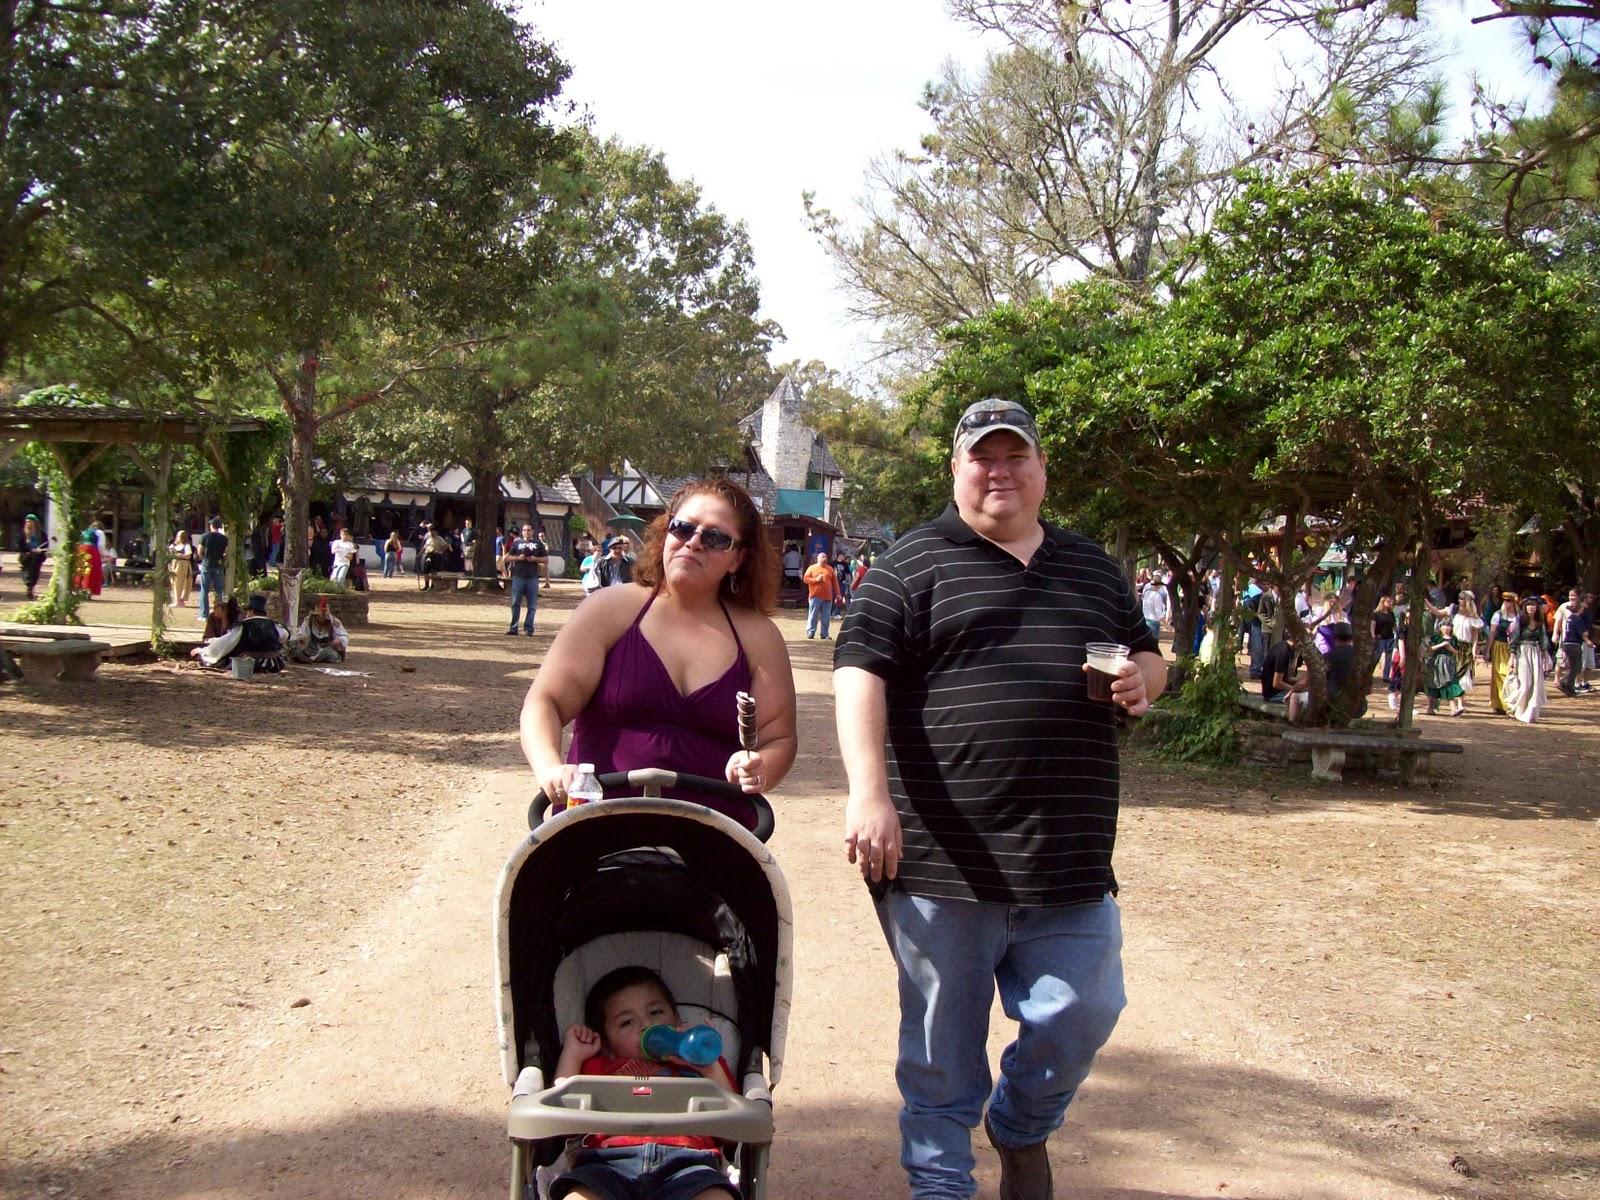 Texas Renaissance Festival - 101_5765.JPG